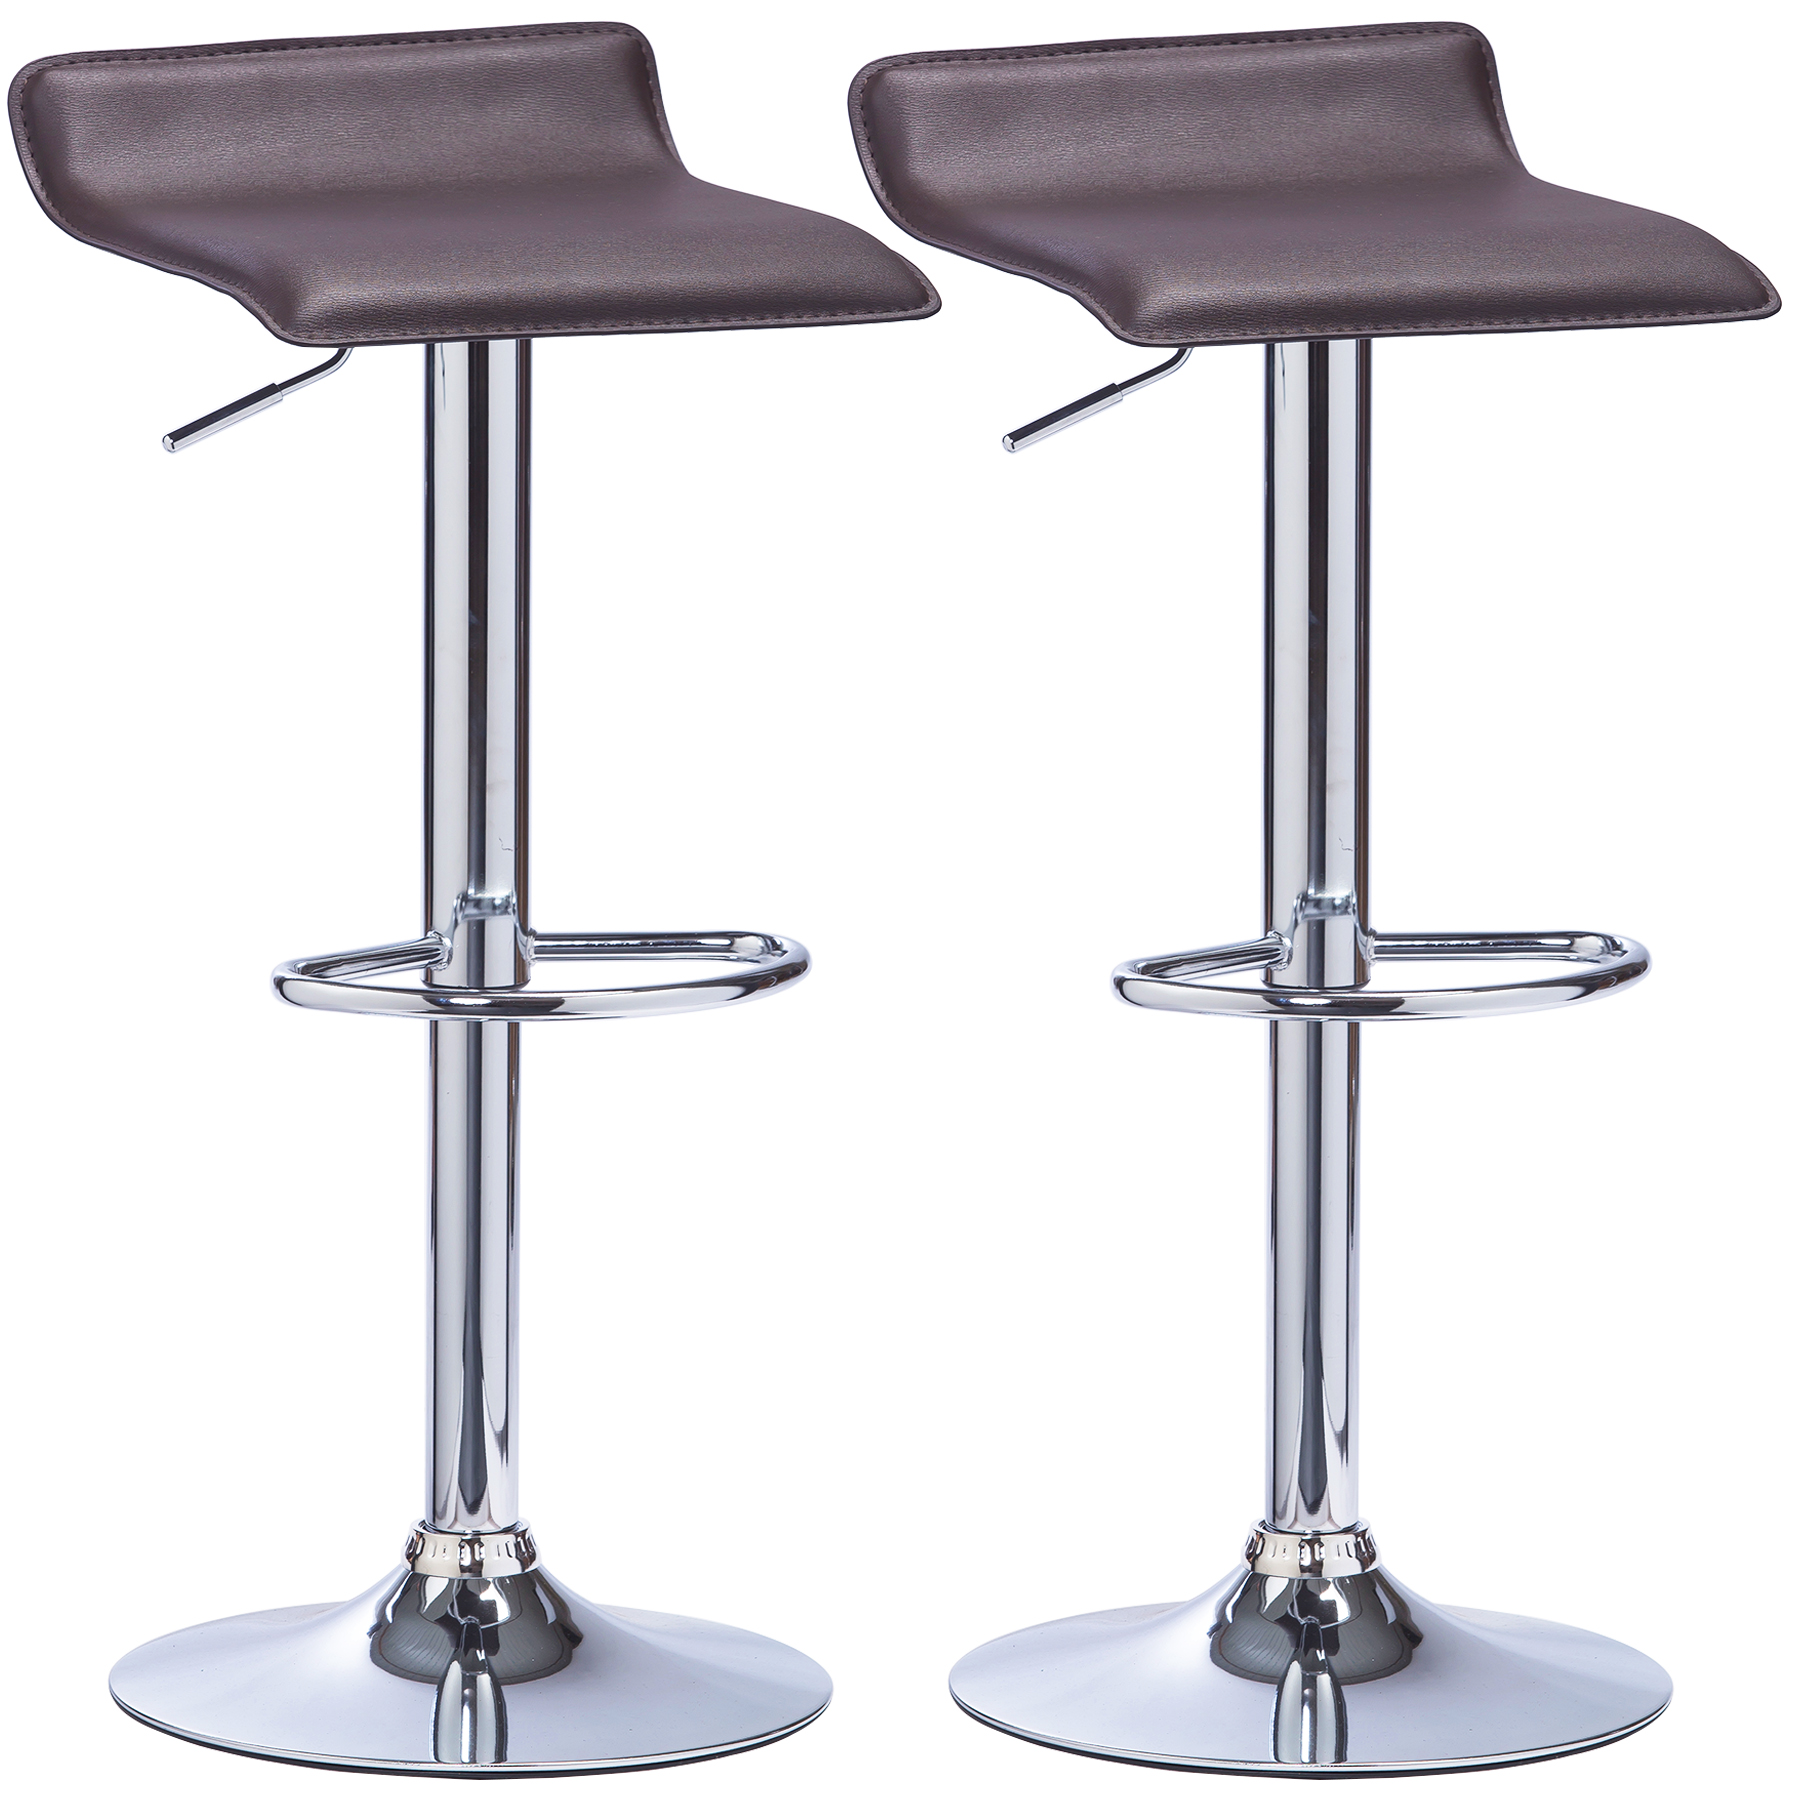 Bar Stools Set Of 2 Swivel Kitchen Breakfast Stools Chair